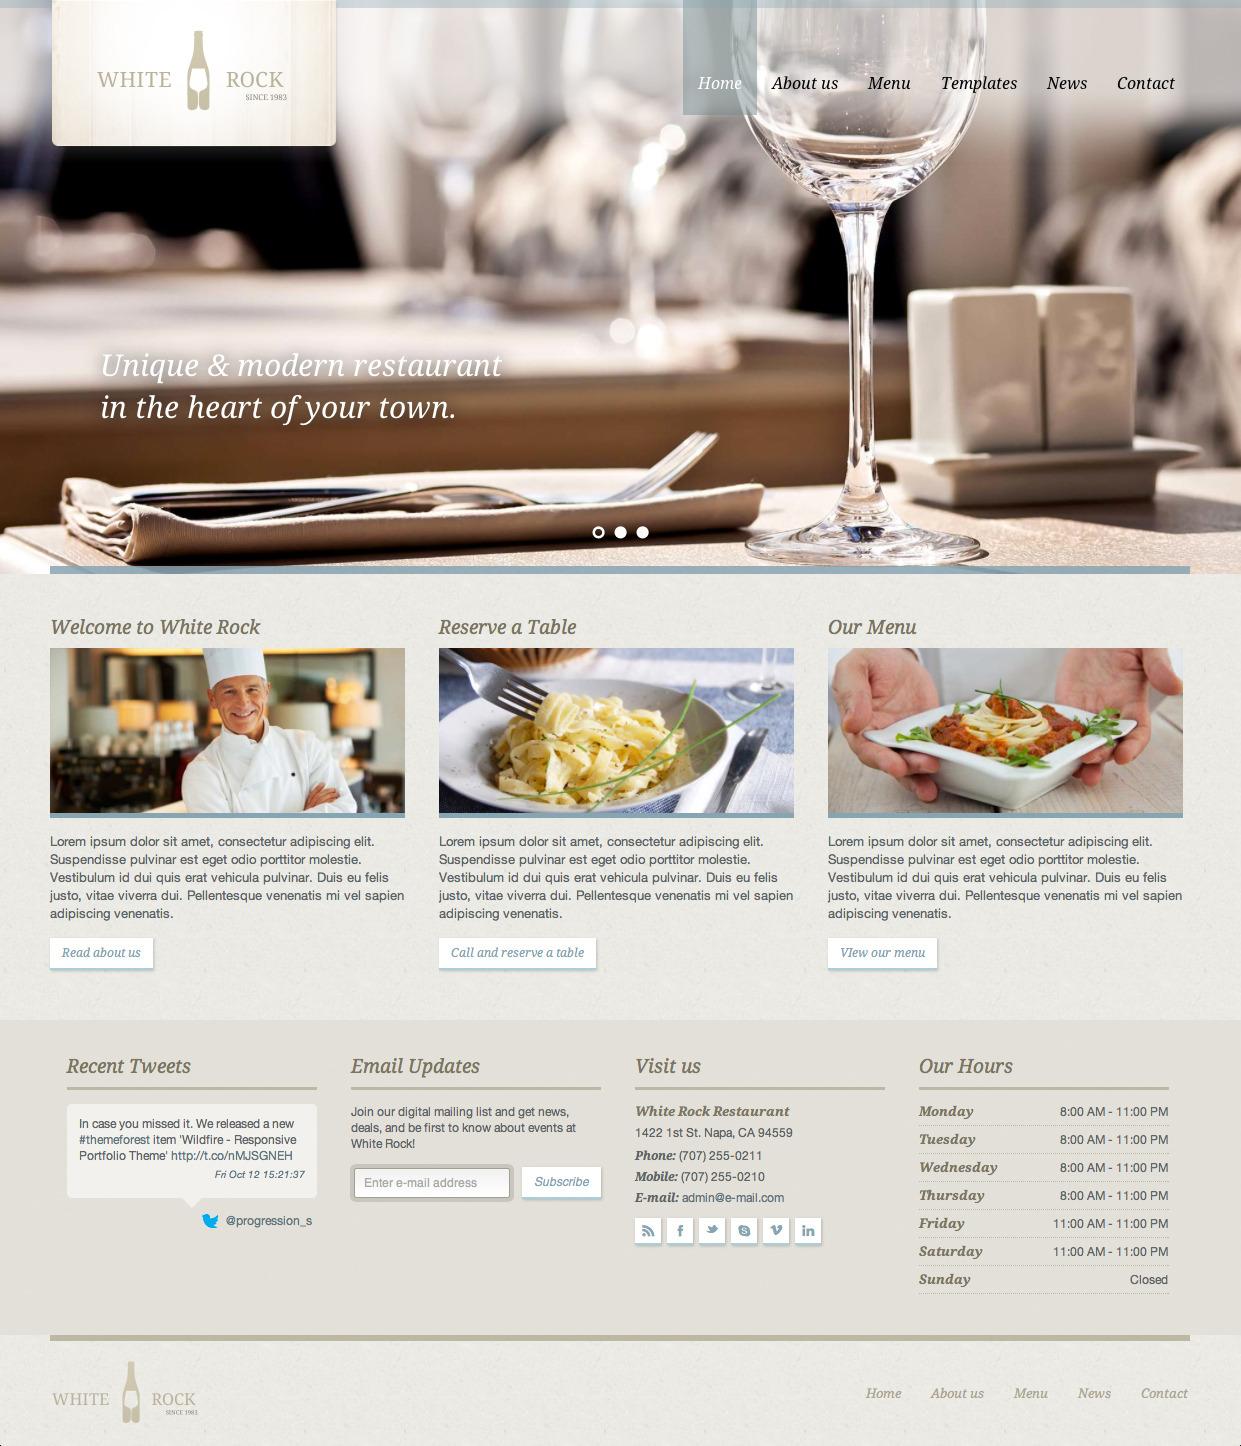 http://2.s3.envato.com/files/38777579/Screenshots/01-WhiteRock-Home.jpg